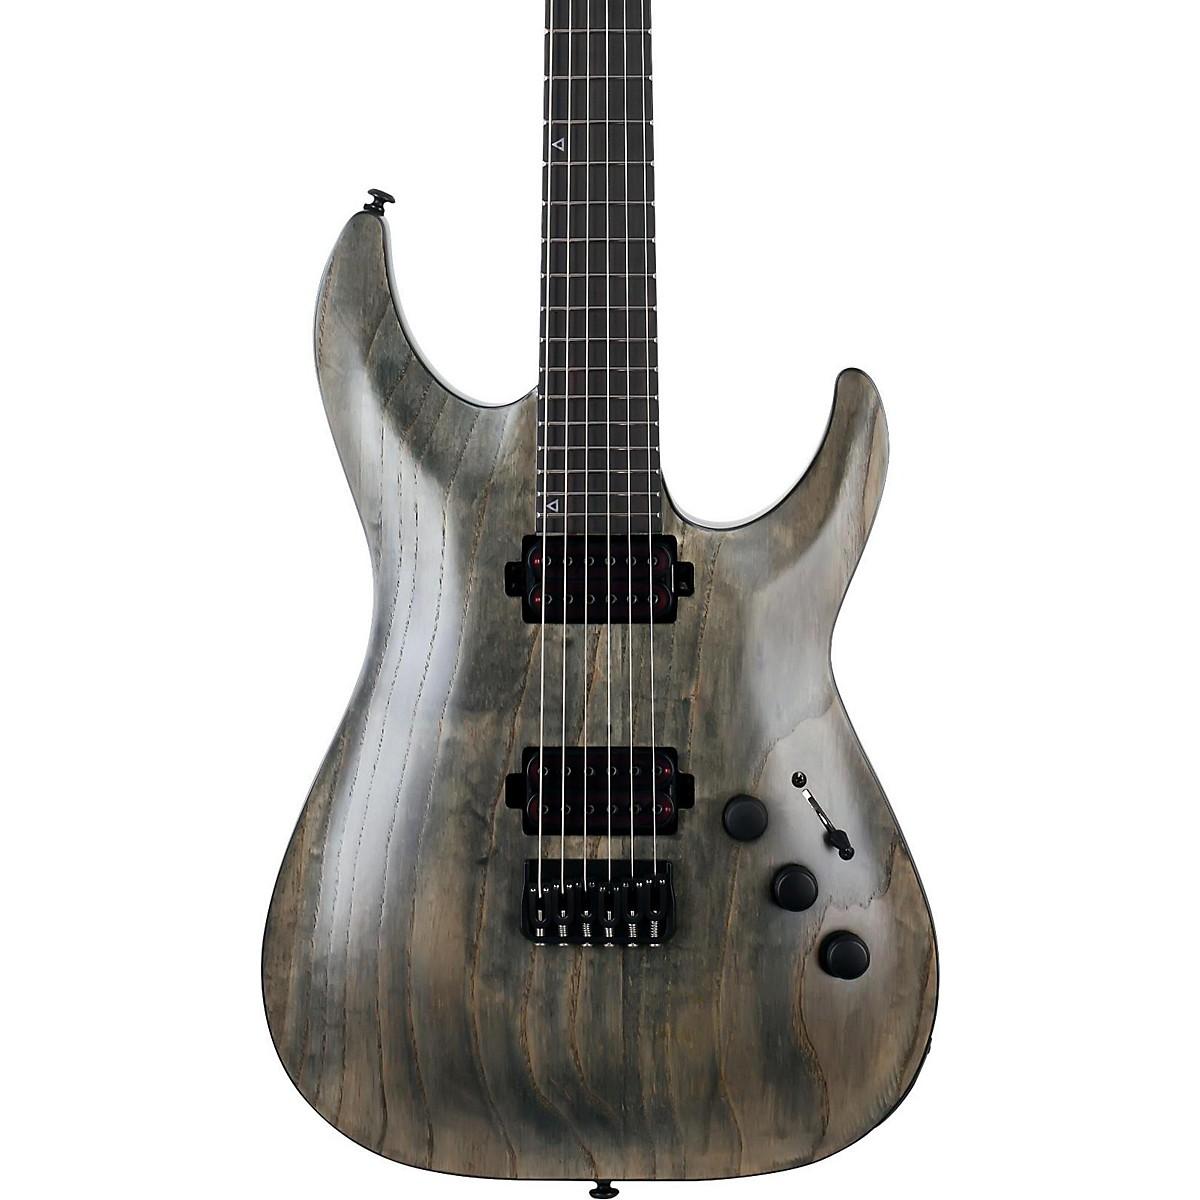 Schecter Guitar Research C-1 Apocalypse Electric Guitar